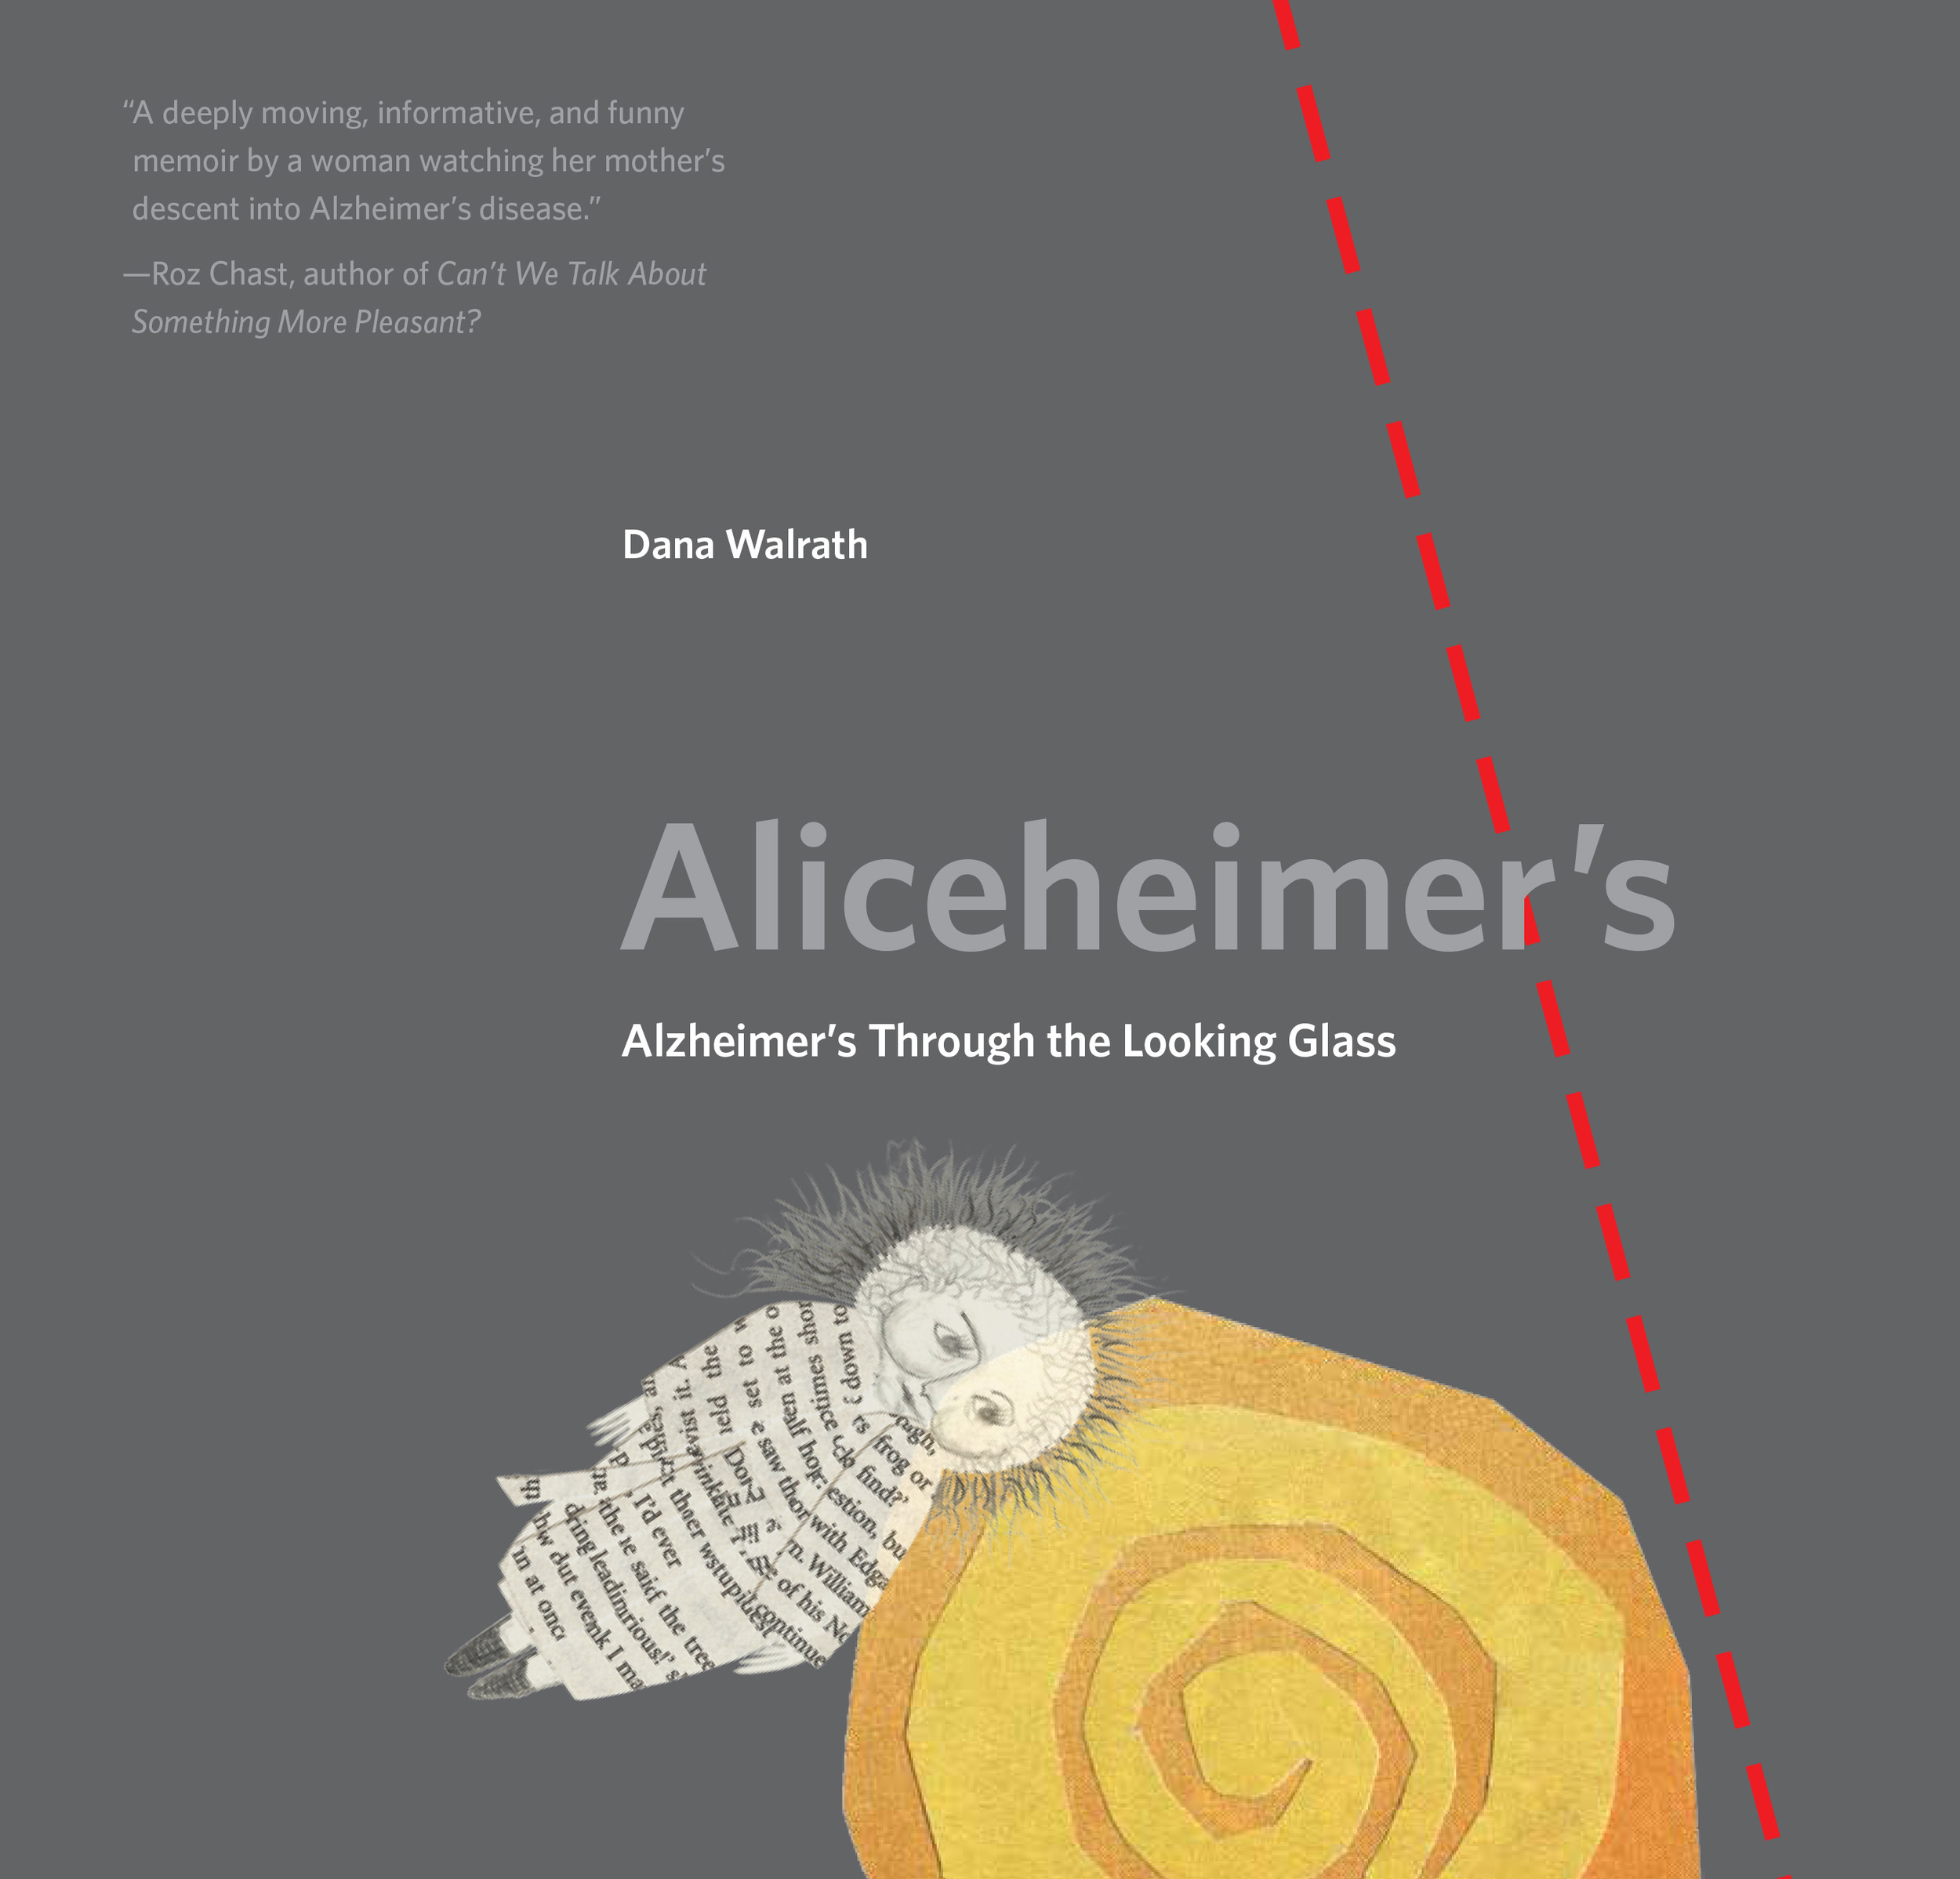 Walrath Aliceheimer¹s_cover crop (2).jpg